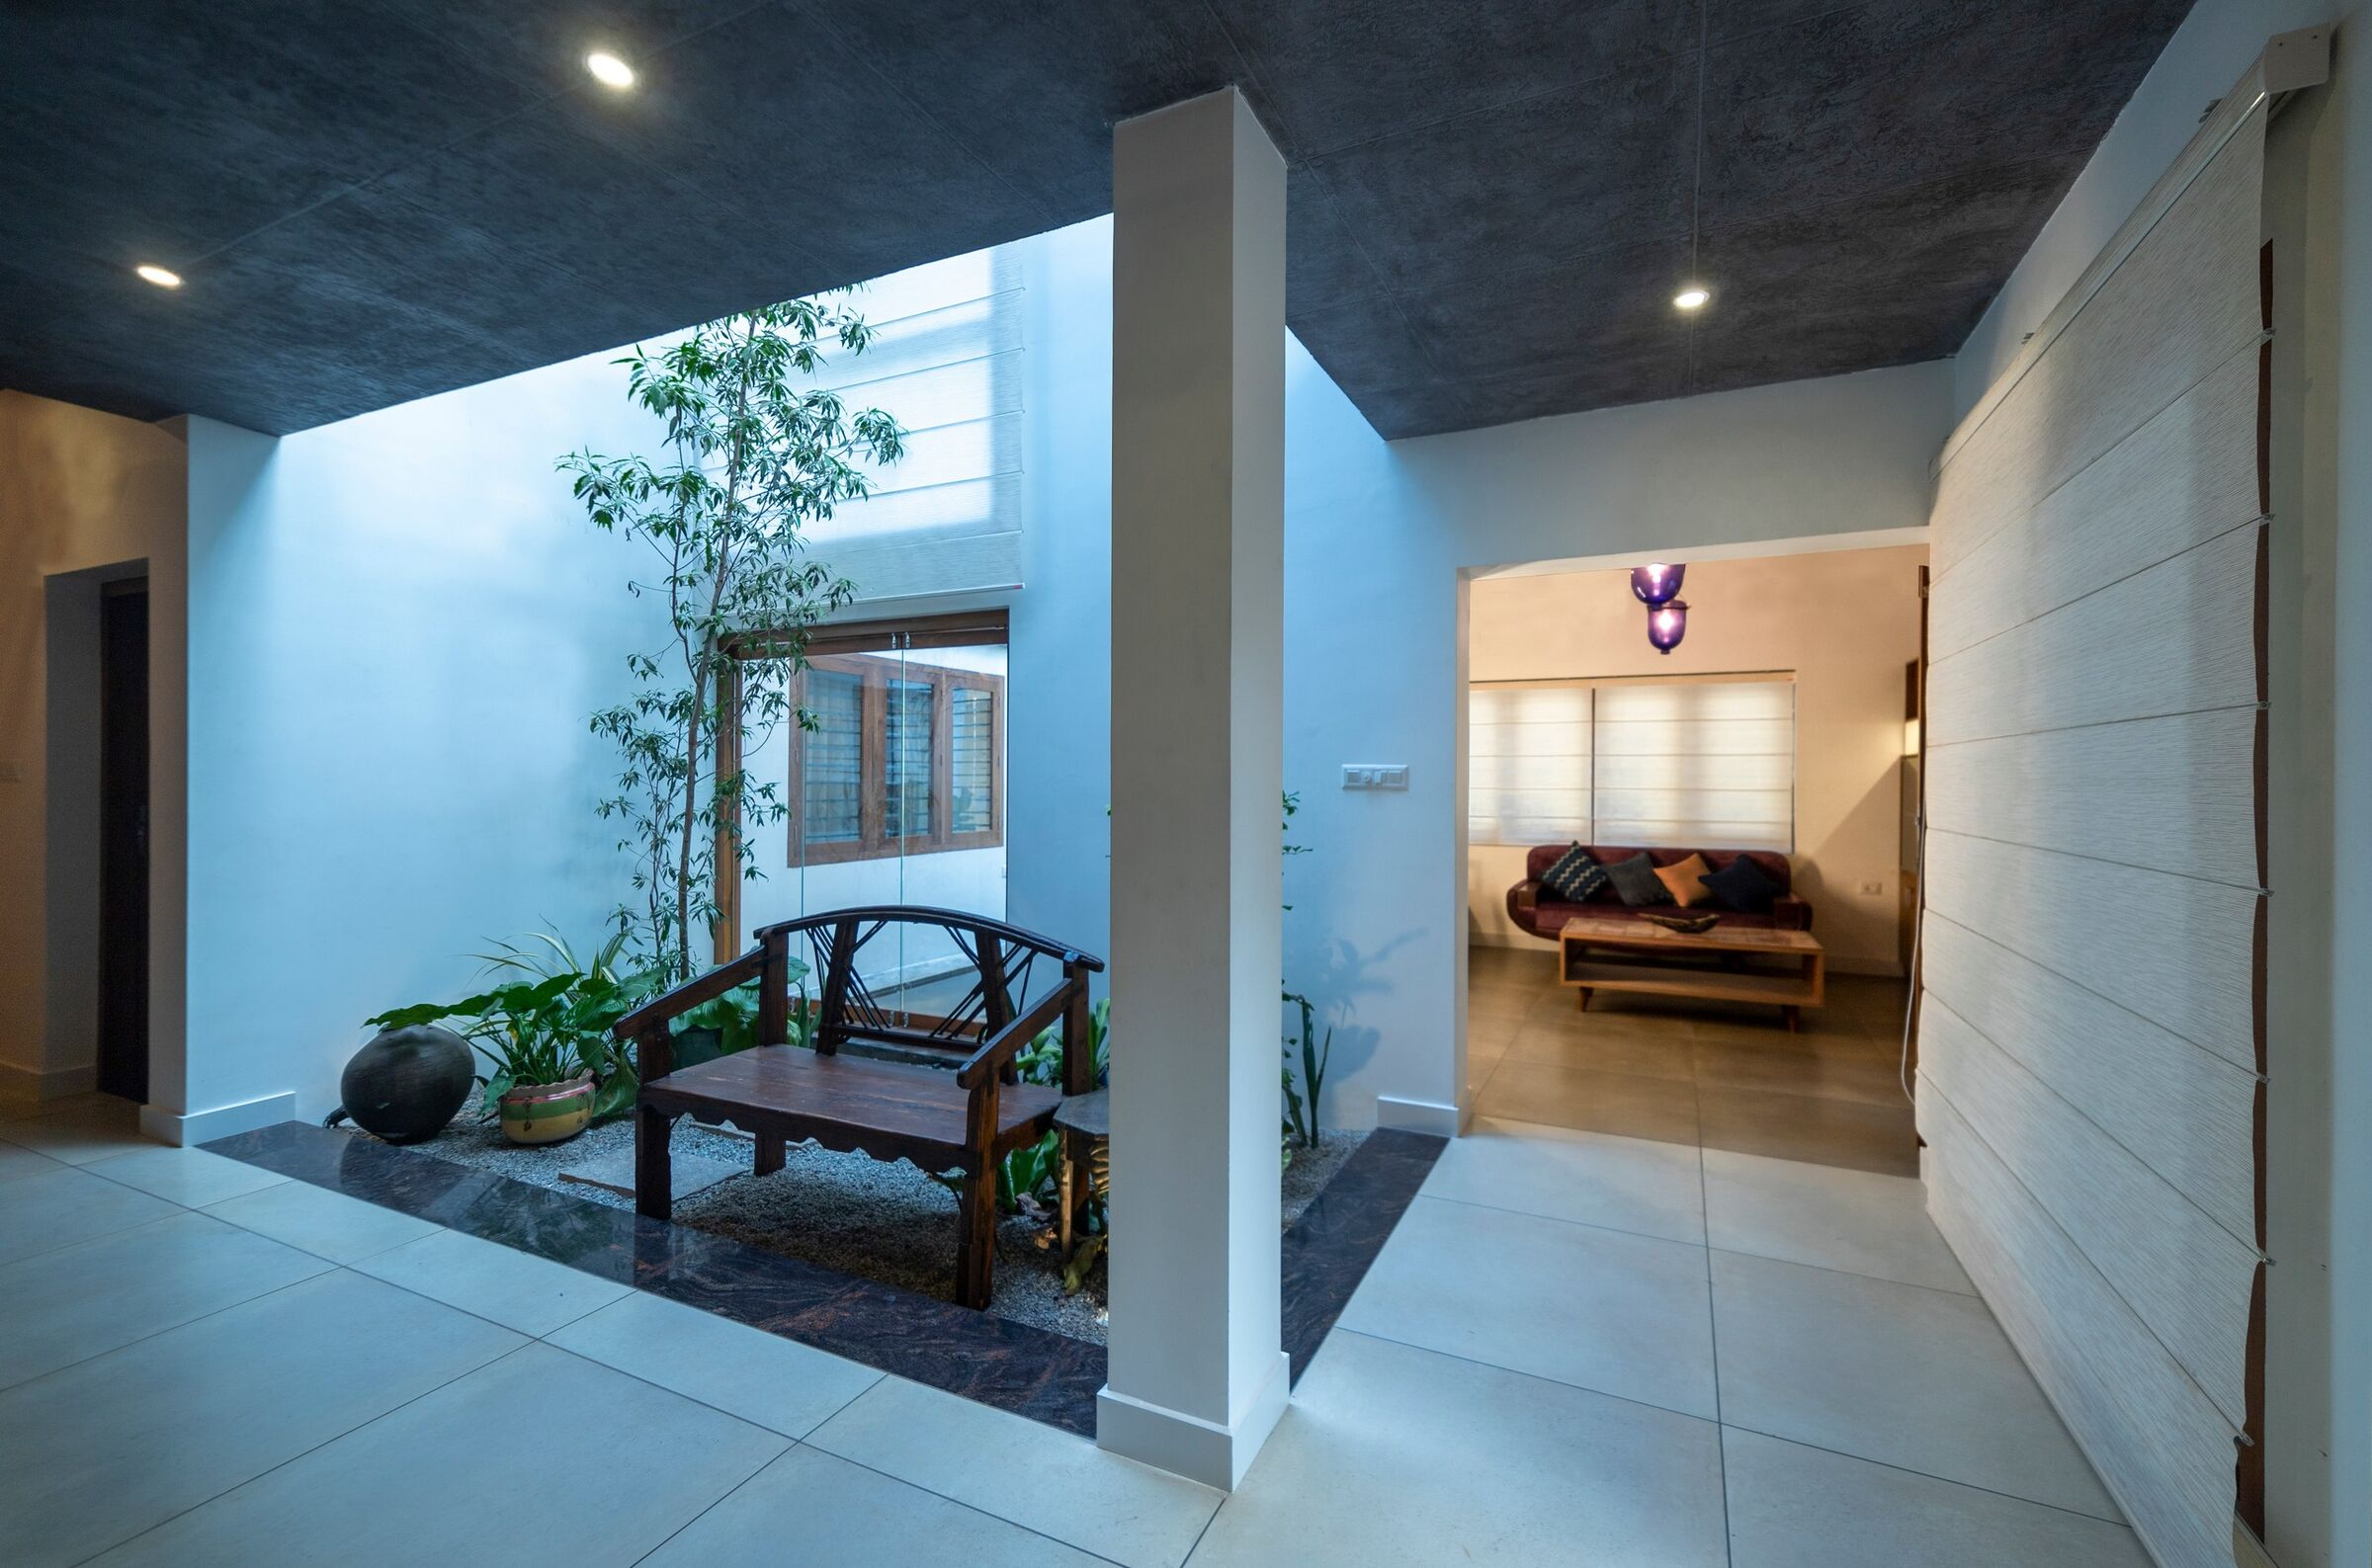 Manjadi House Of The Bead Tree No Architects Designers And Social Artists Medios De Comunicacion Fotos Y Videos 10 Archello